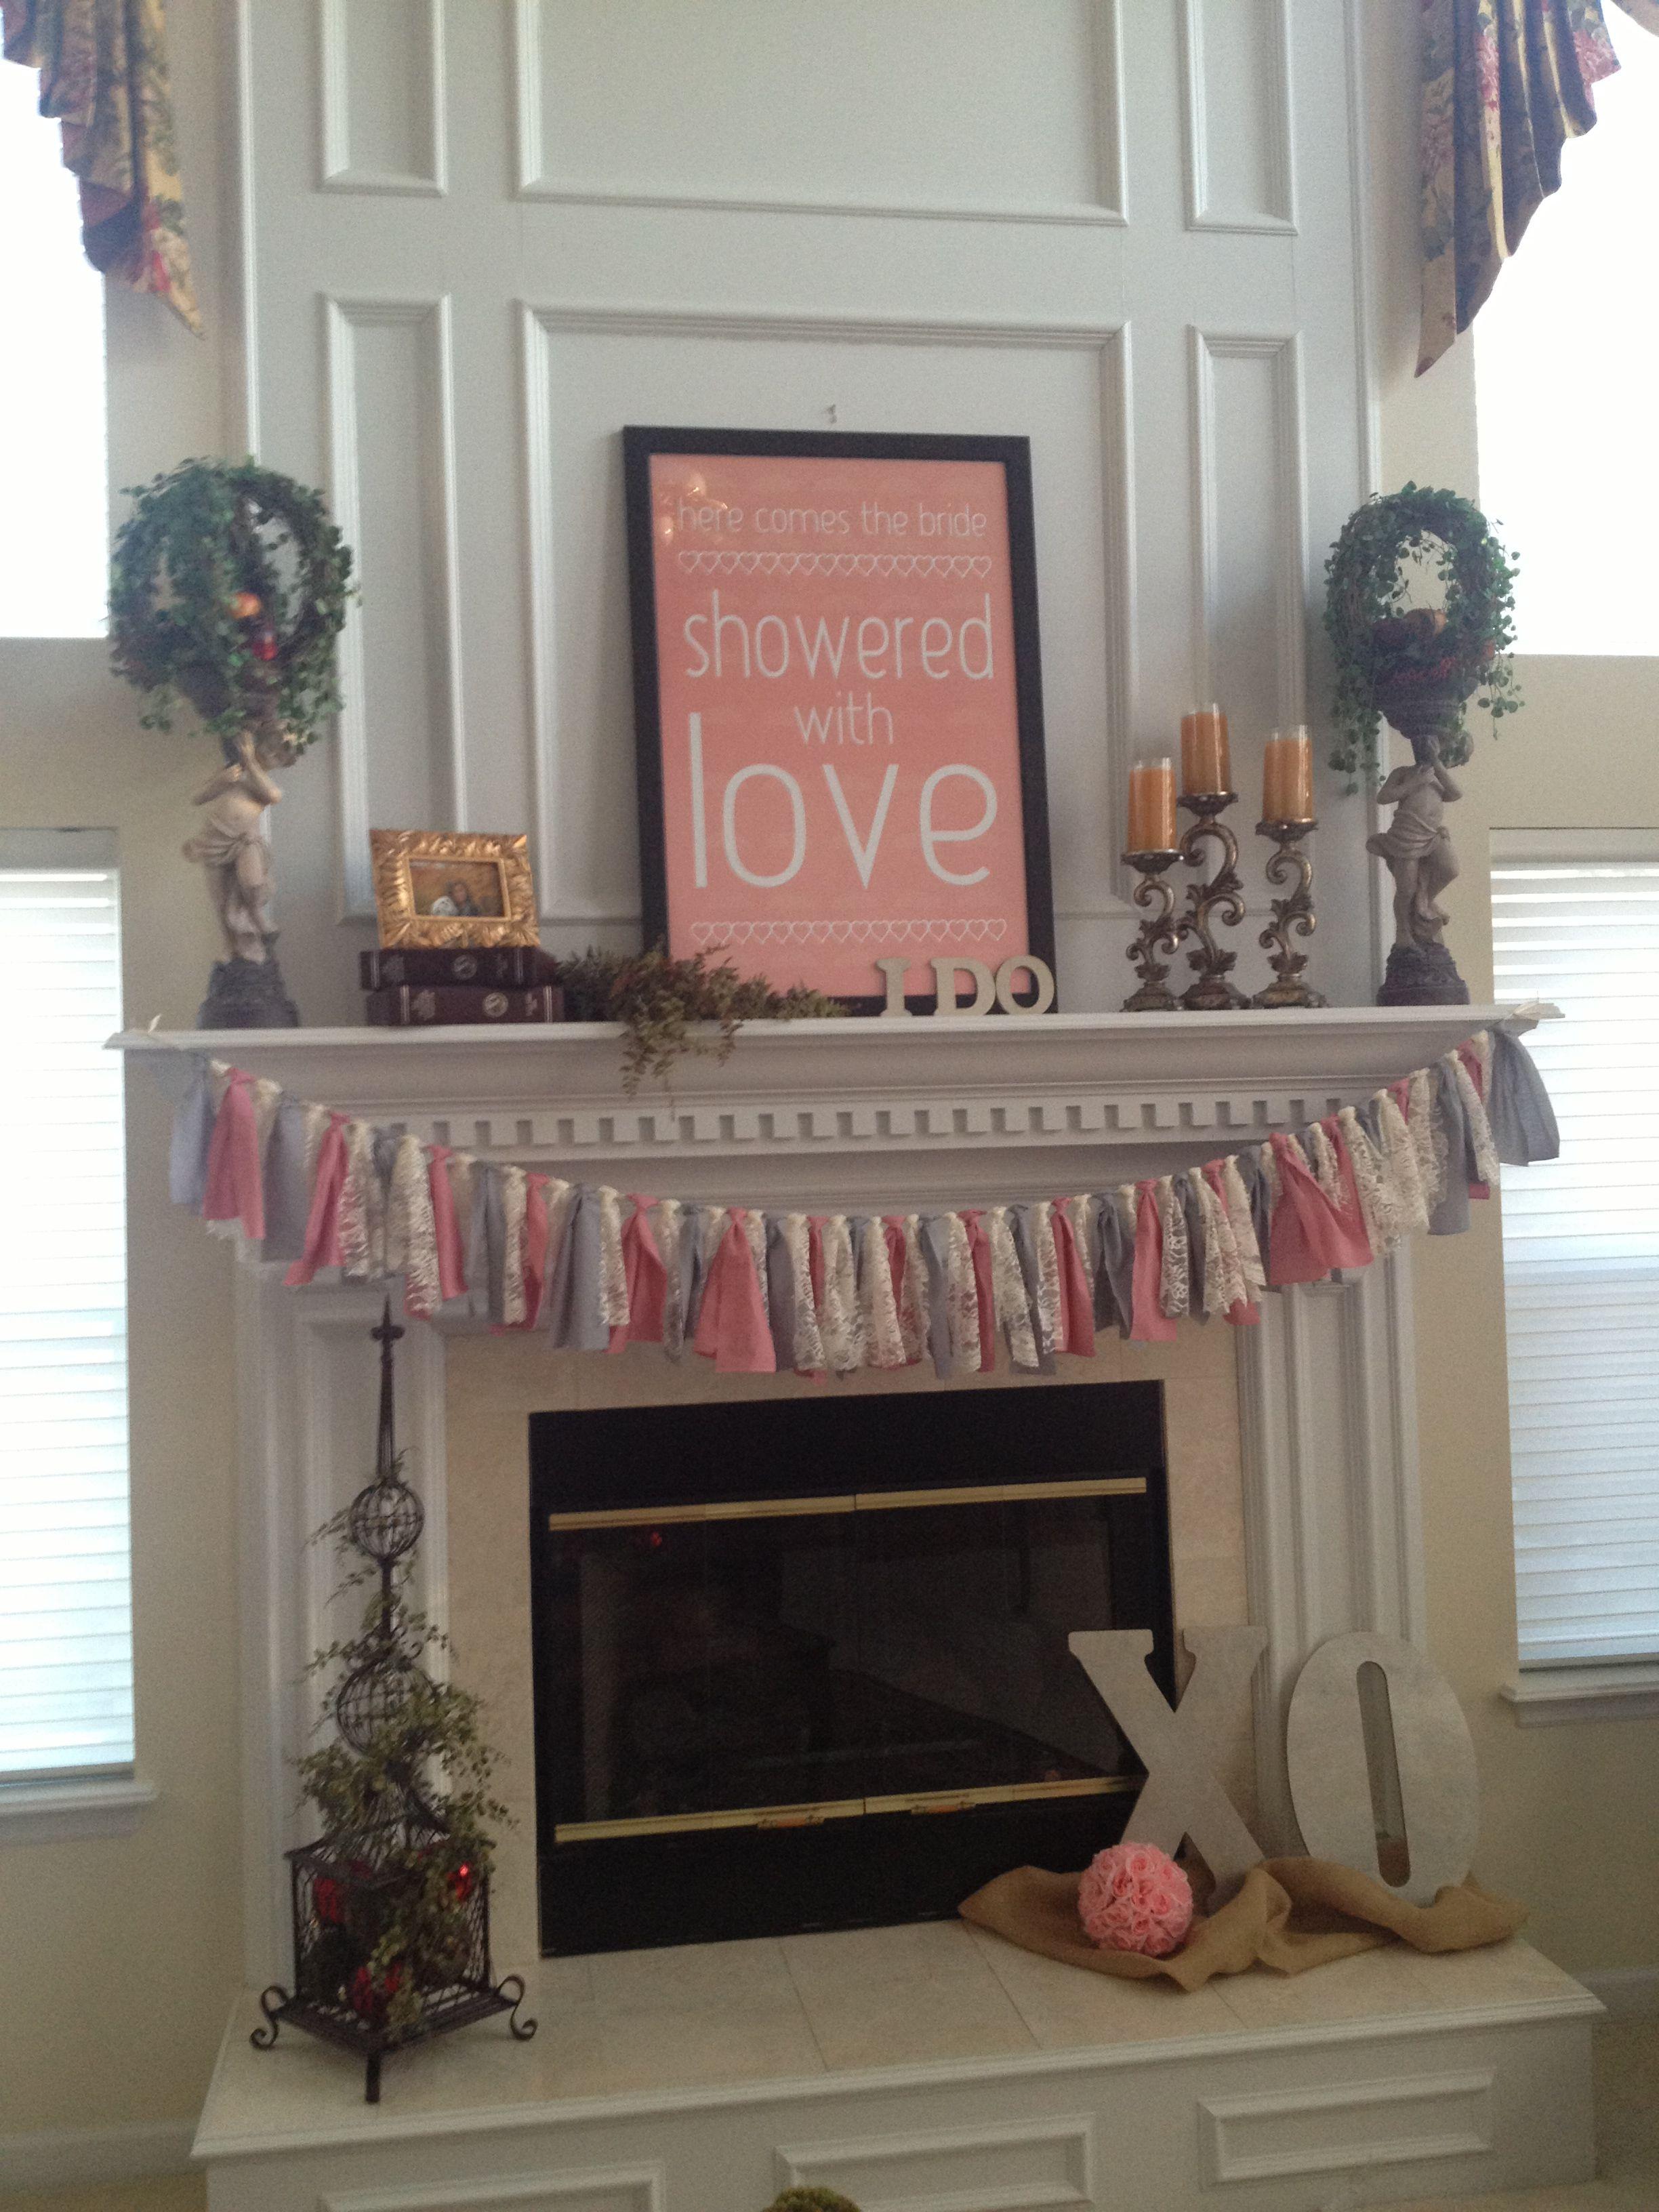 Romantic Themed Bridal Shower. Mantle/Fireplace Decor